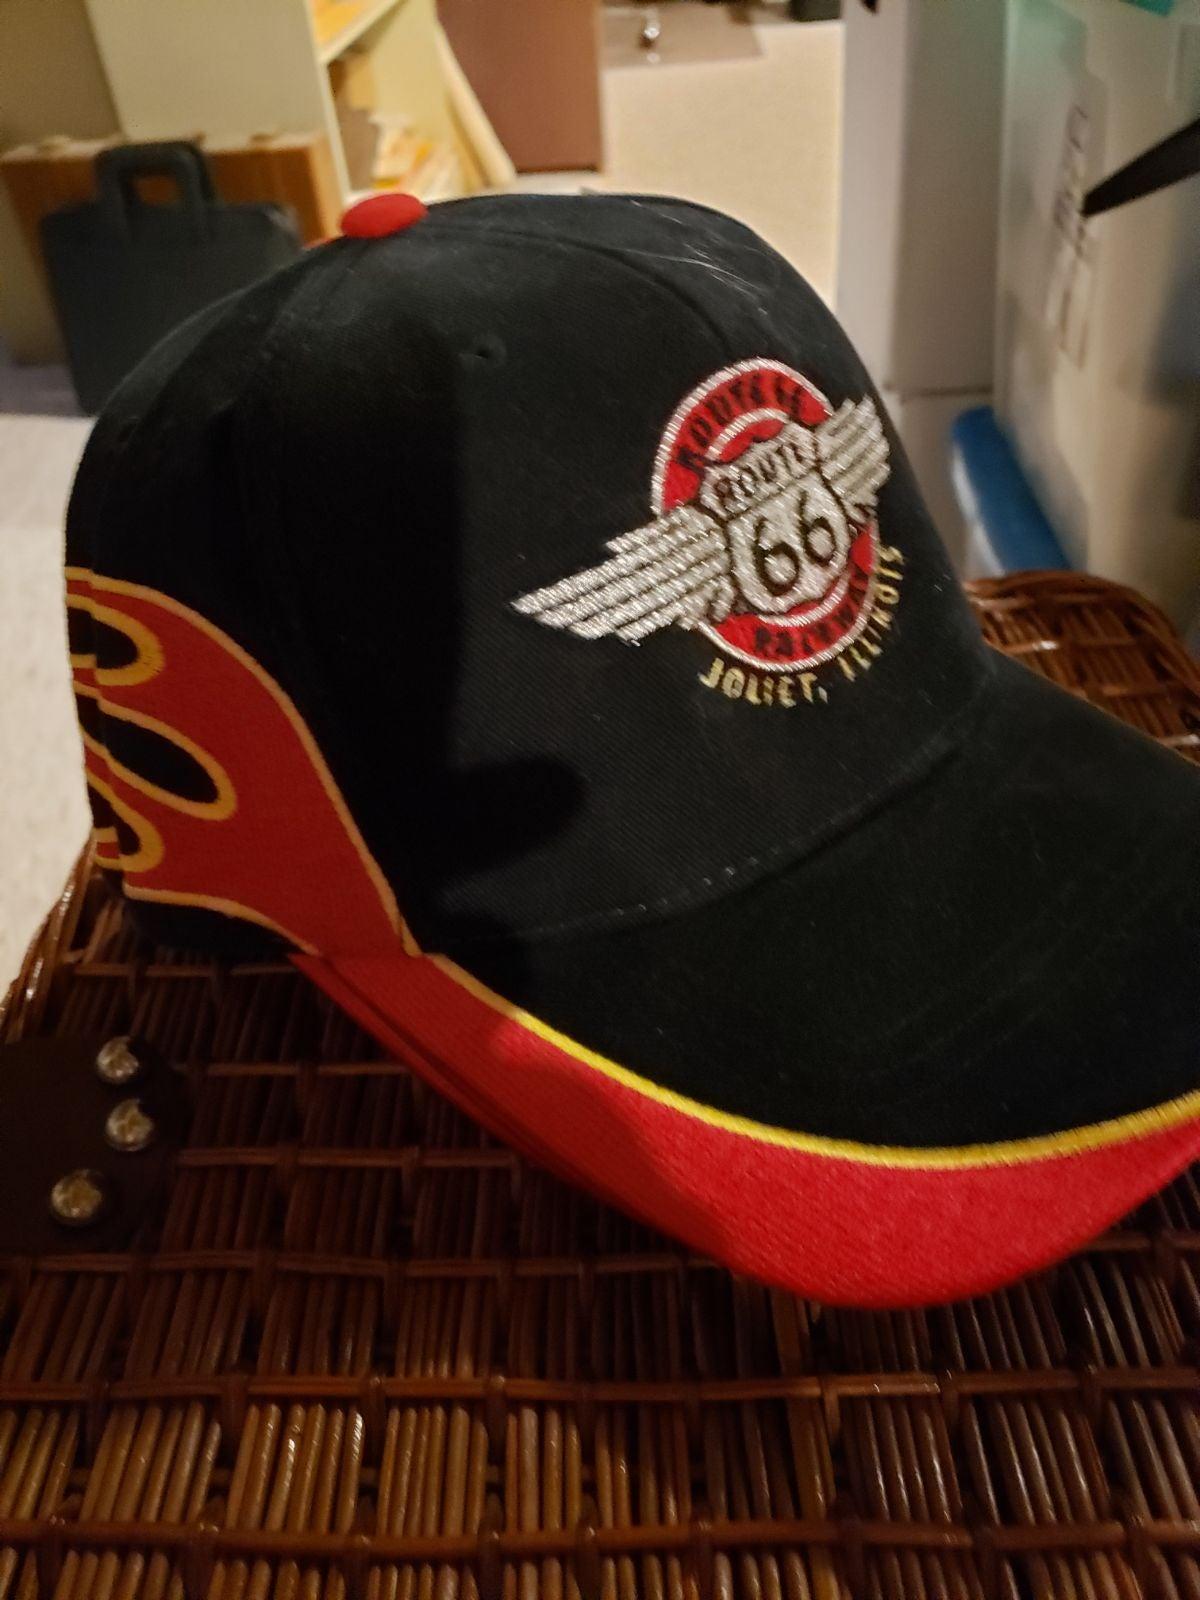 Route 66 Joliet Speedway Hat